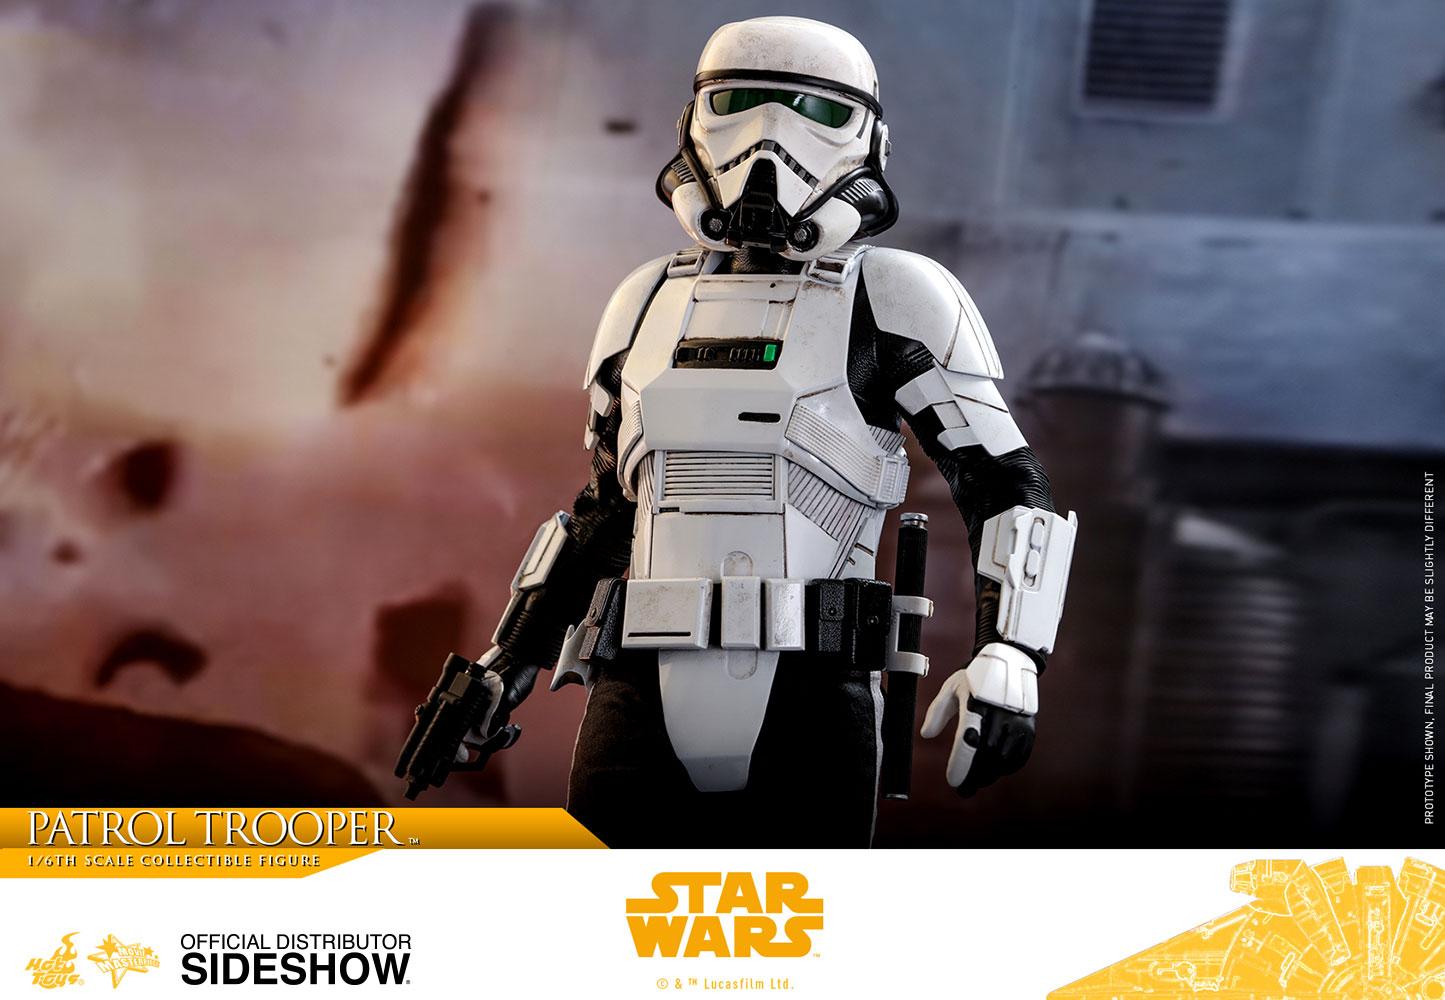 Imperial-Patrol-Trooper-sixth-scale-figure-02